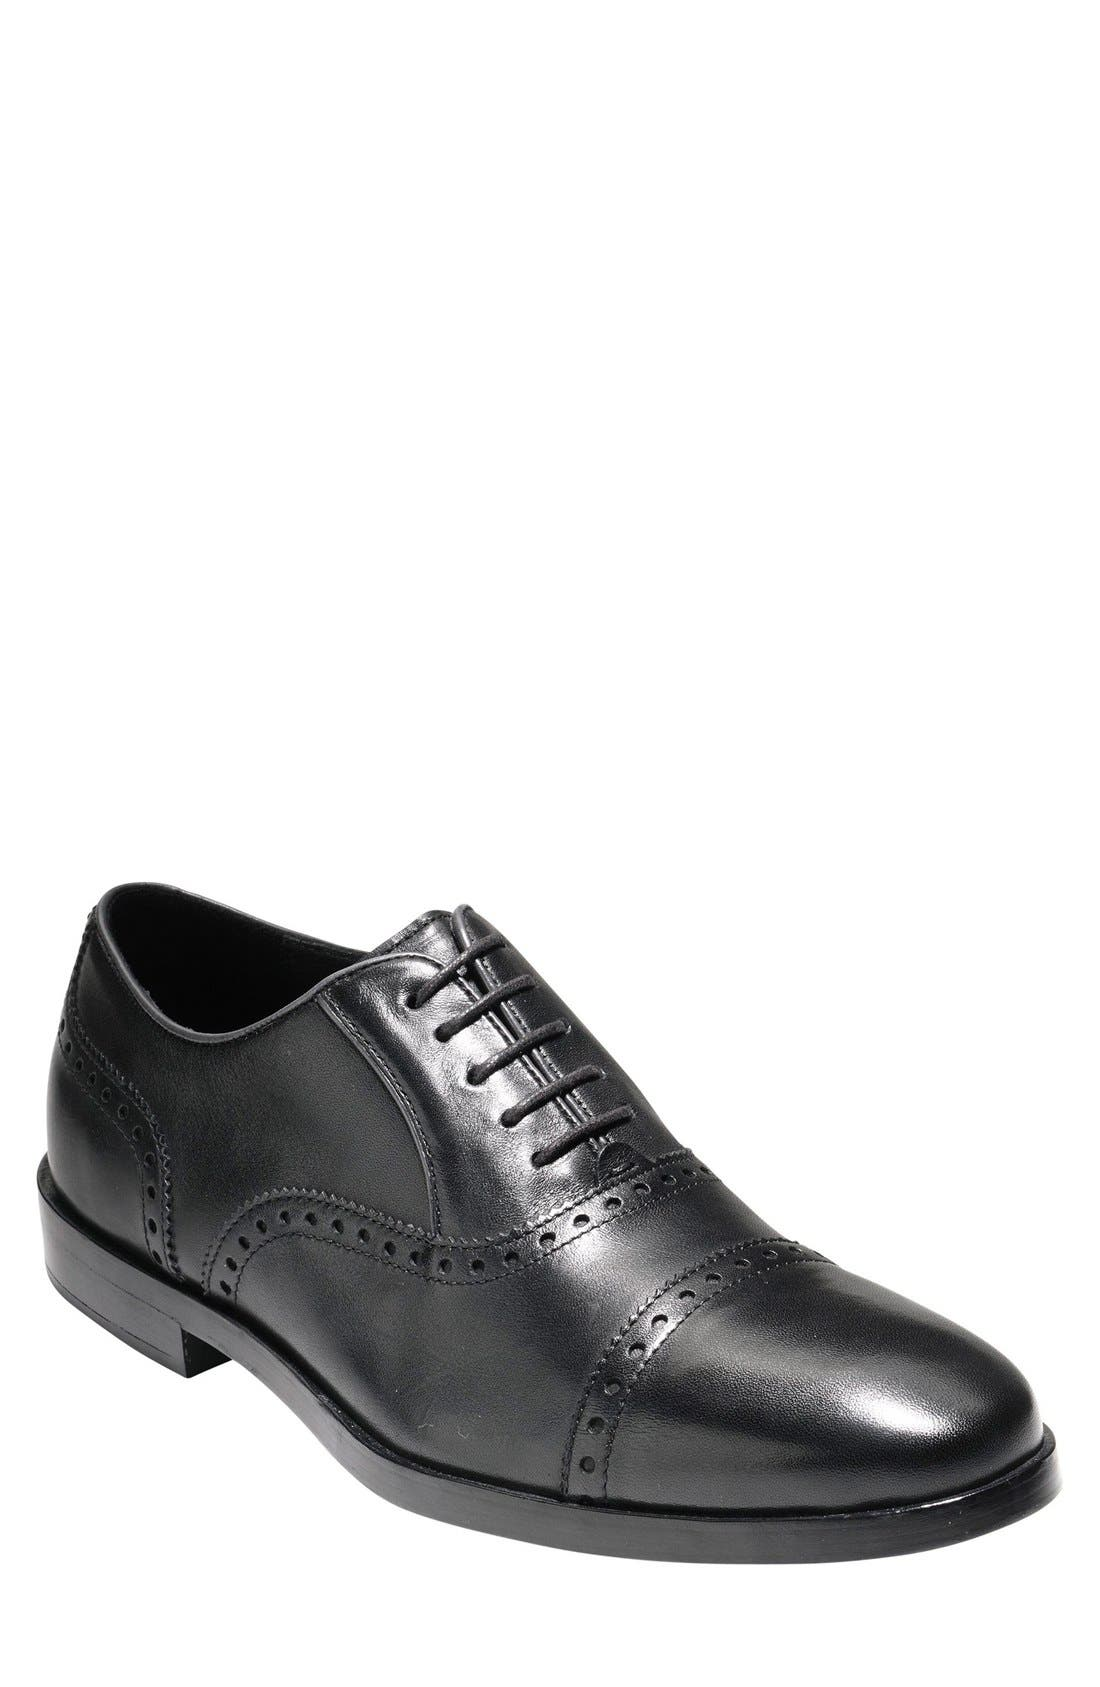 'Hamilton' Cap Toe Oxford, Main, color, BLACK LEATHER